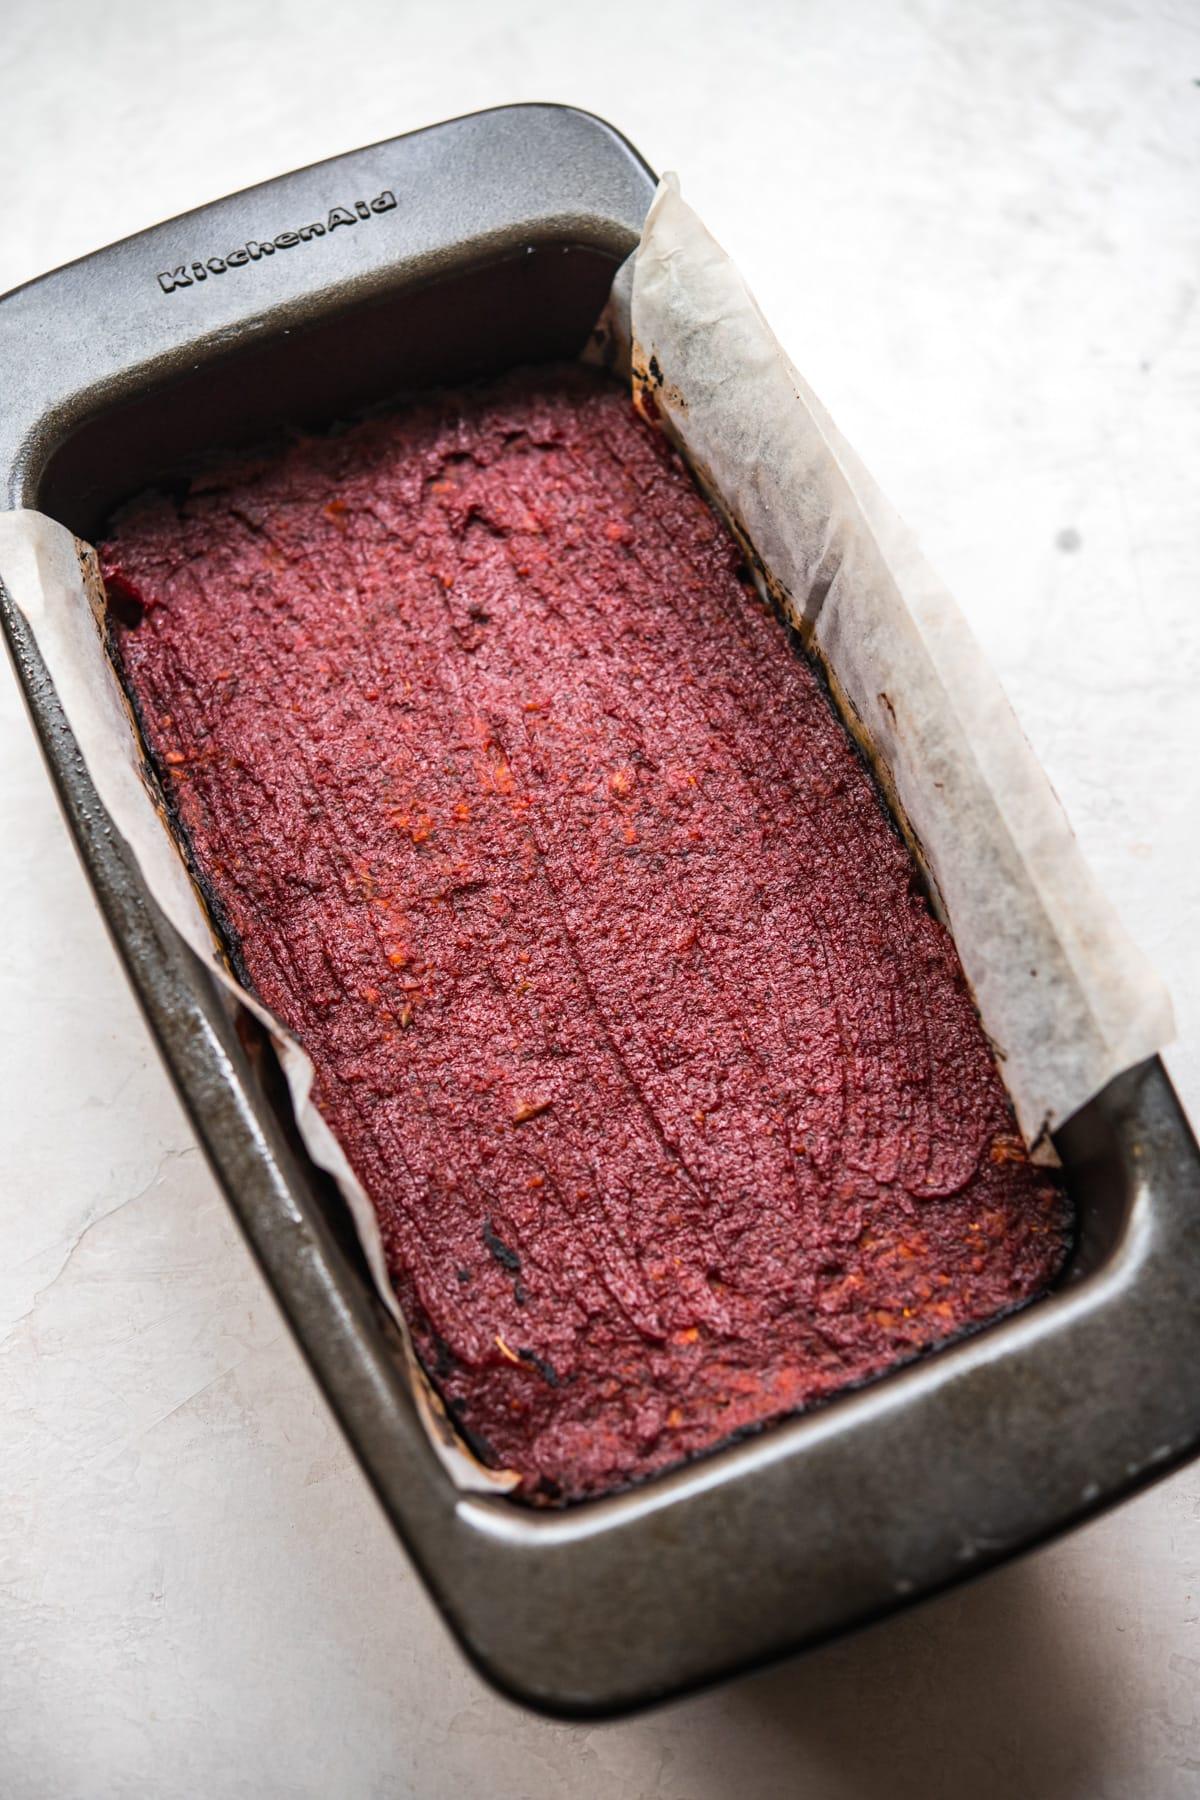 side view of baked vegan meatloaf in a loaf pan.